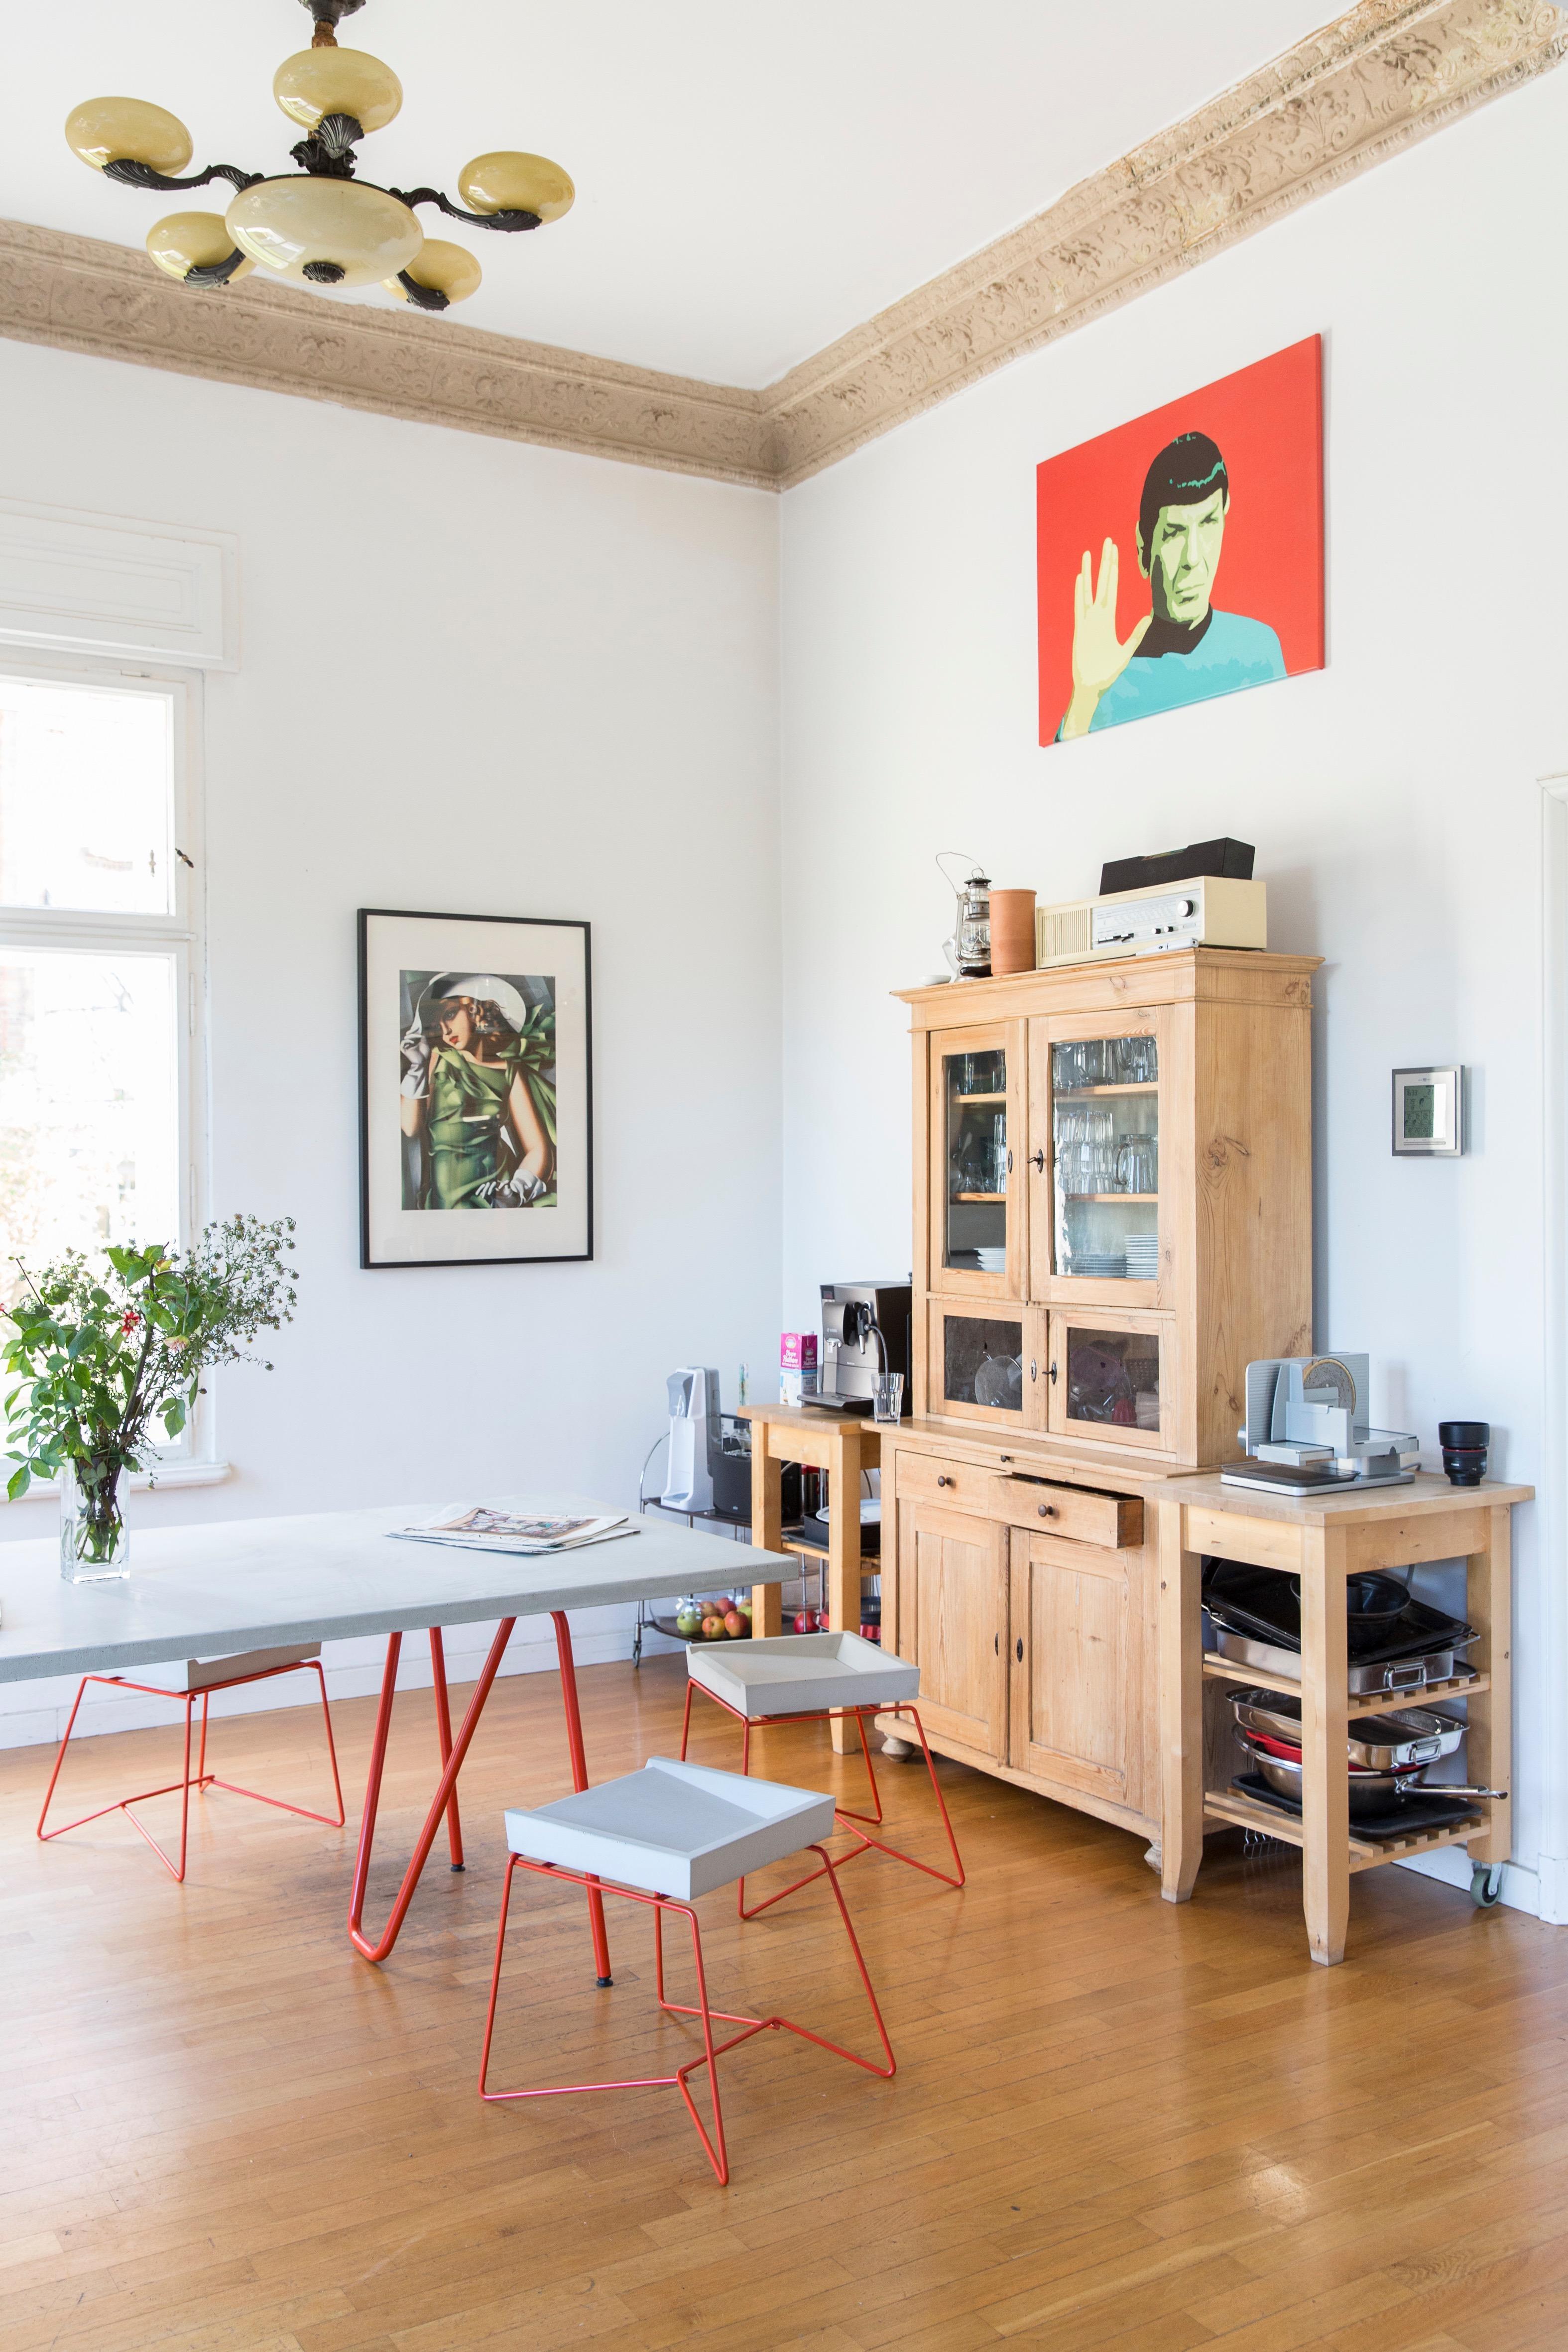 Betonmöbel • Bilder & Ideen • COUCHstyle